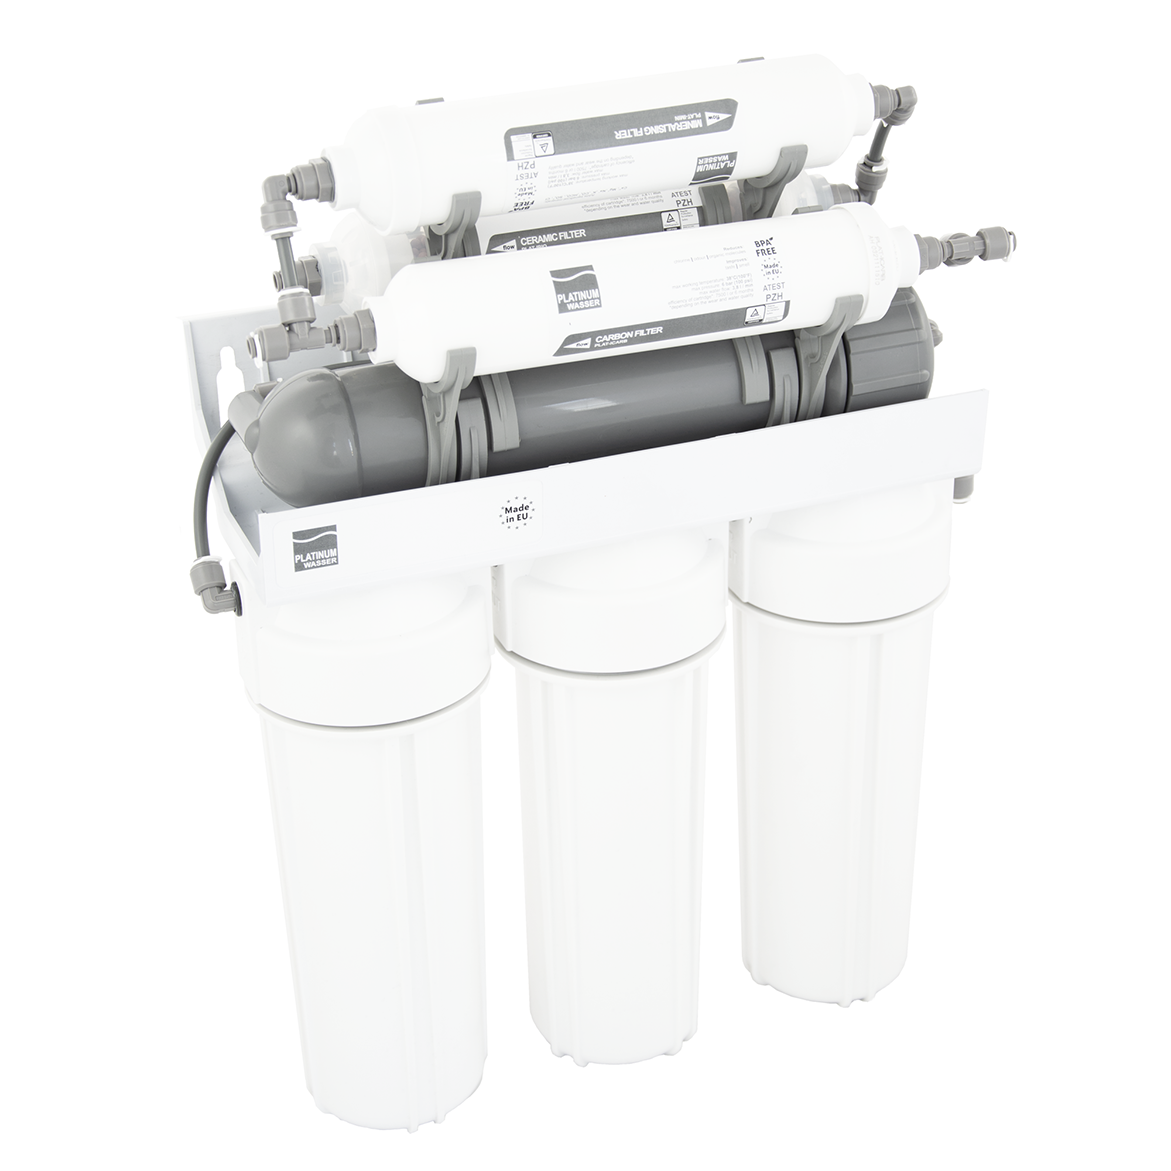 Platinum Wasser Ultra 7, система обратного осмоса с минерализатором (RO7 PLAT-F-ULTRA7)